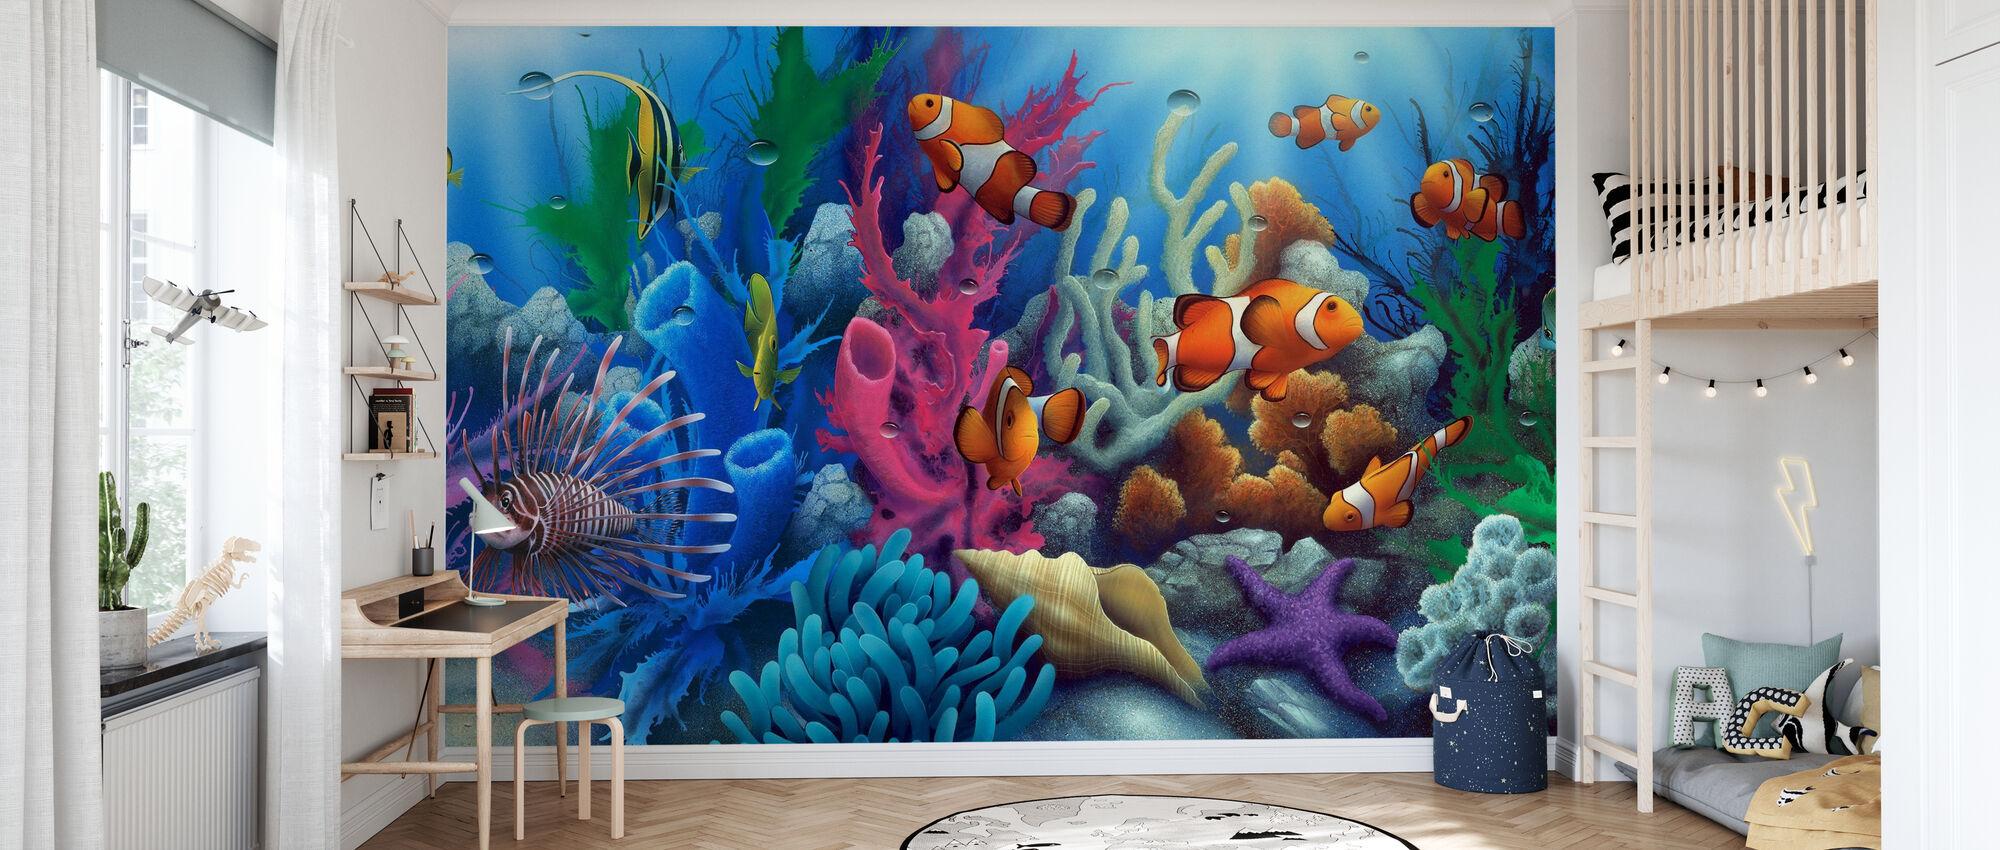 Around The World 2 - Wallpaper - Kids Room